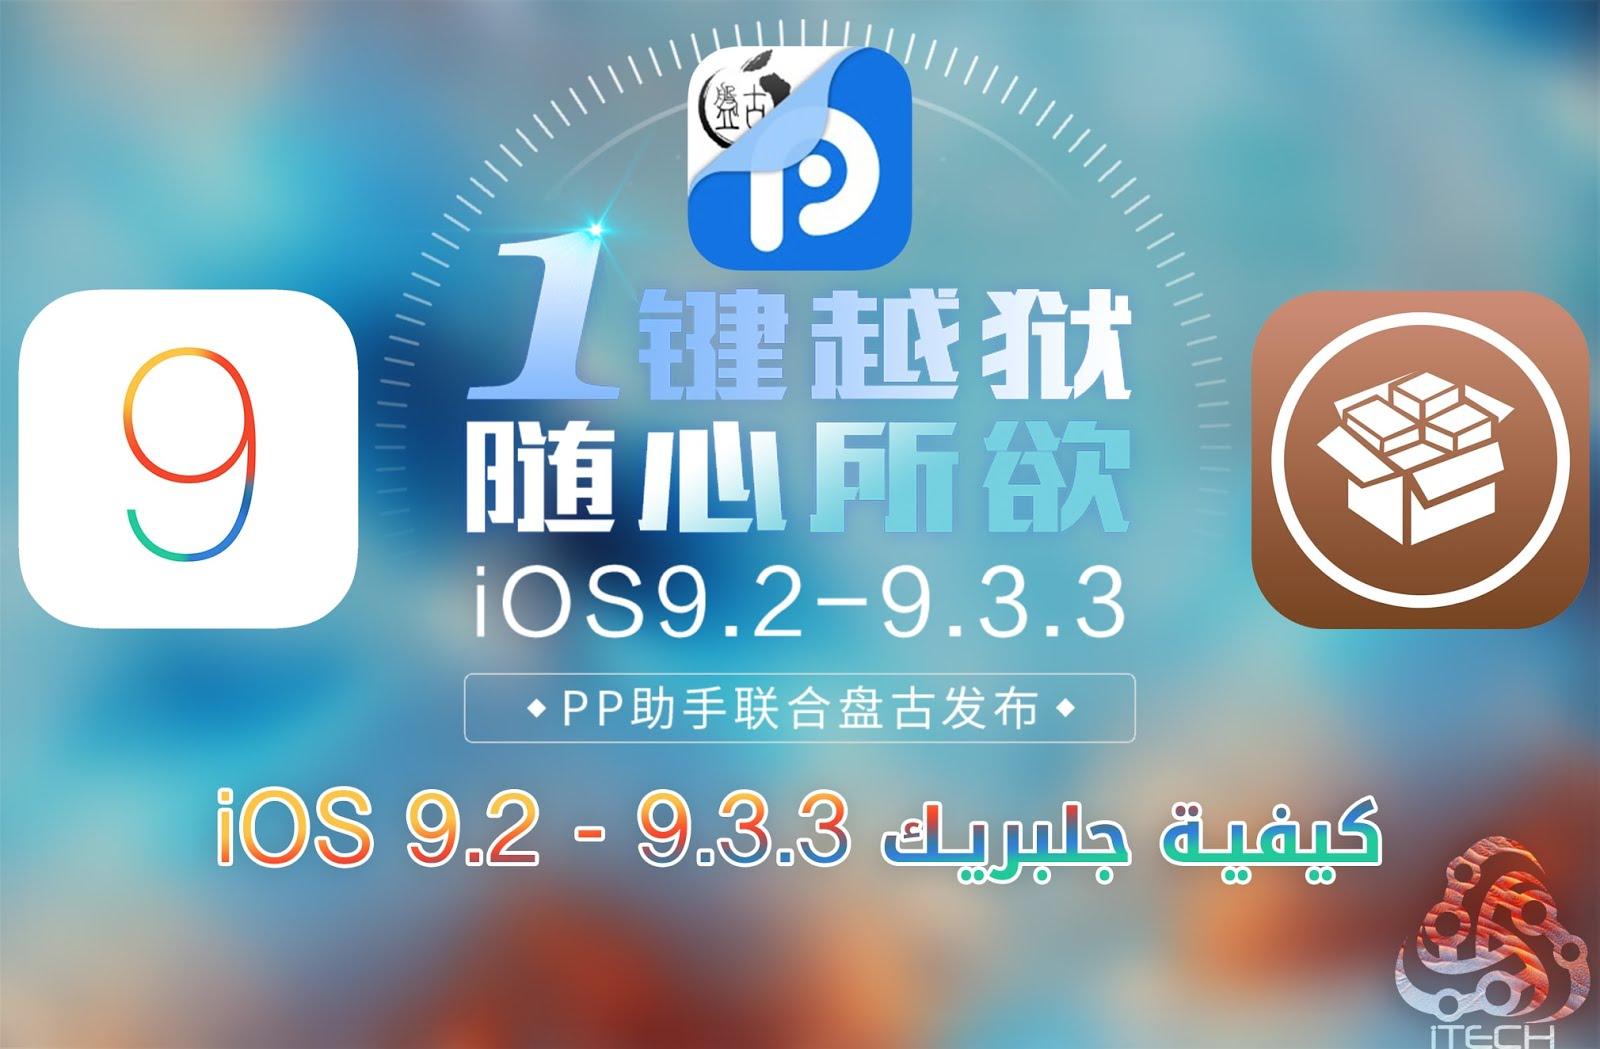 iOS 9.2 - 9.3.3 كيفية جلبريك